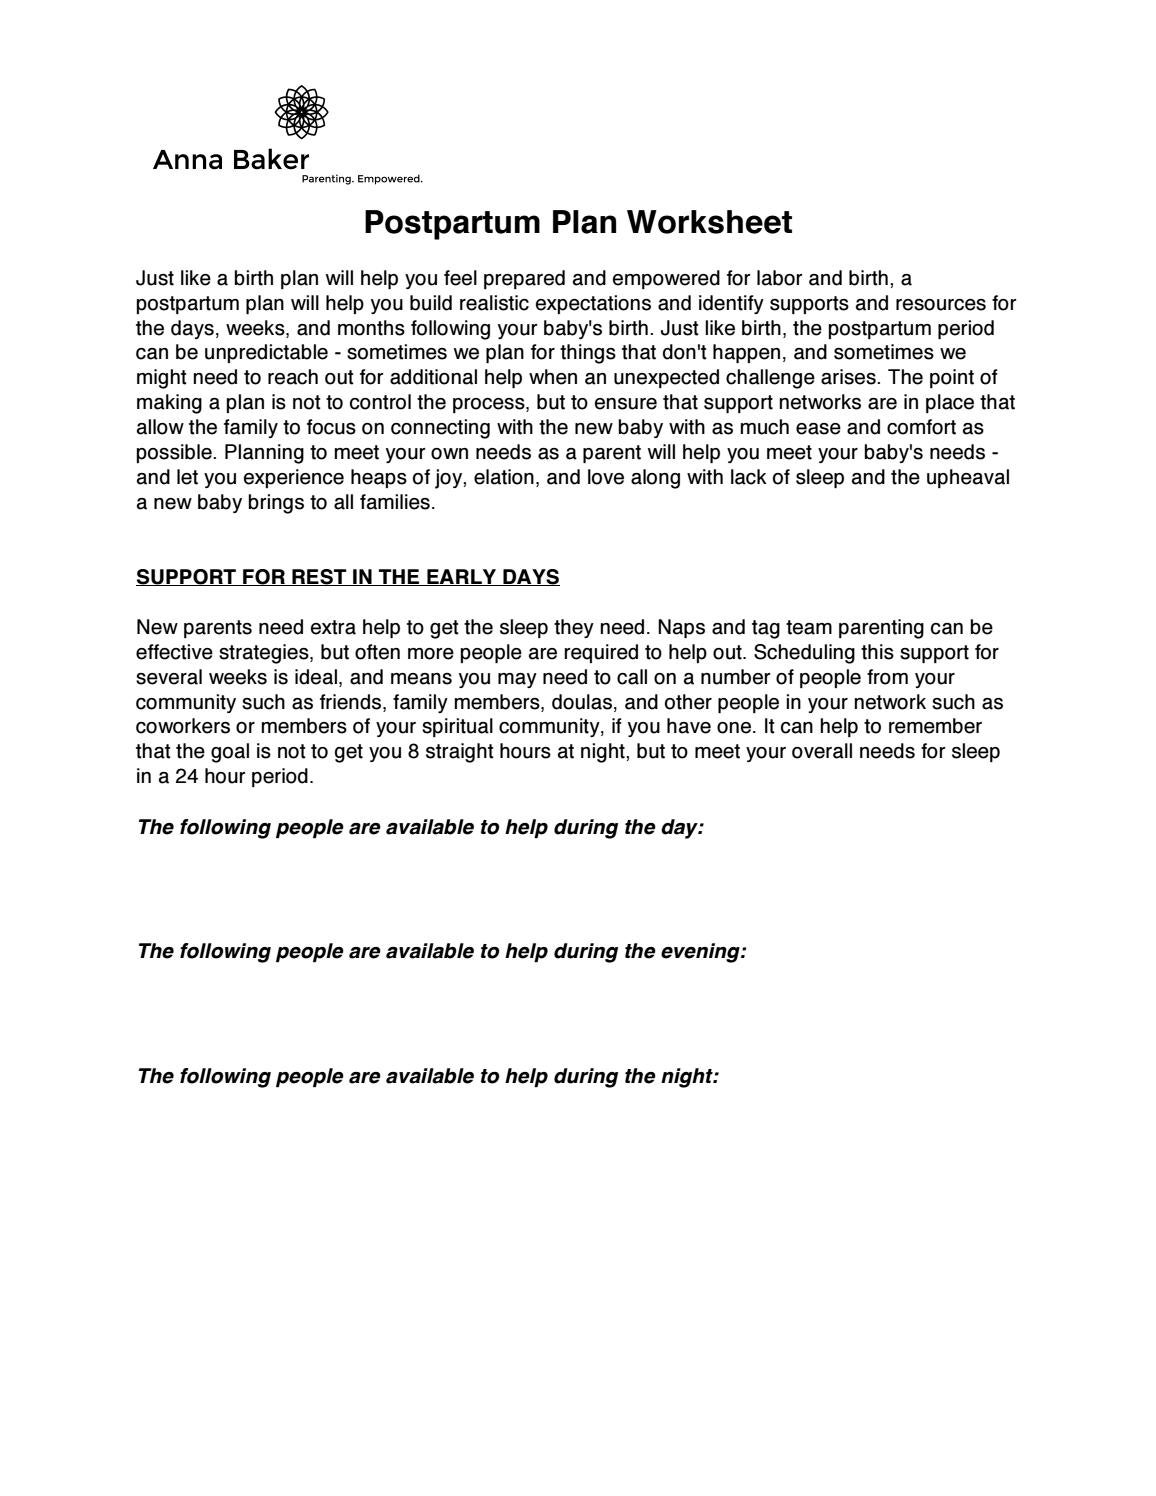 Postpartum plan worksheet feb 12 2017 by anna baker issuu robcynllc Images